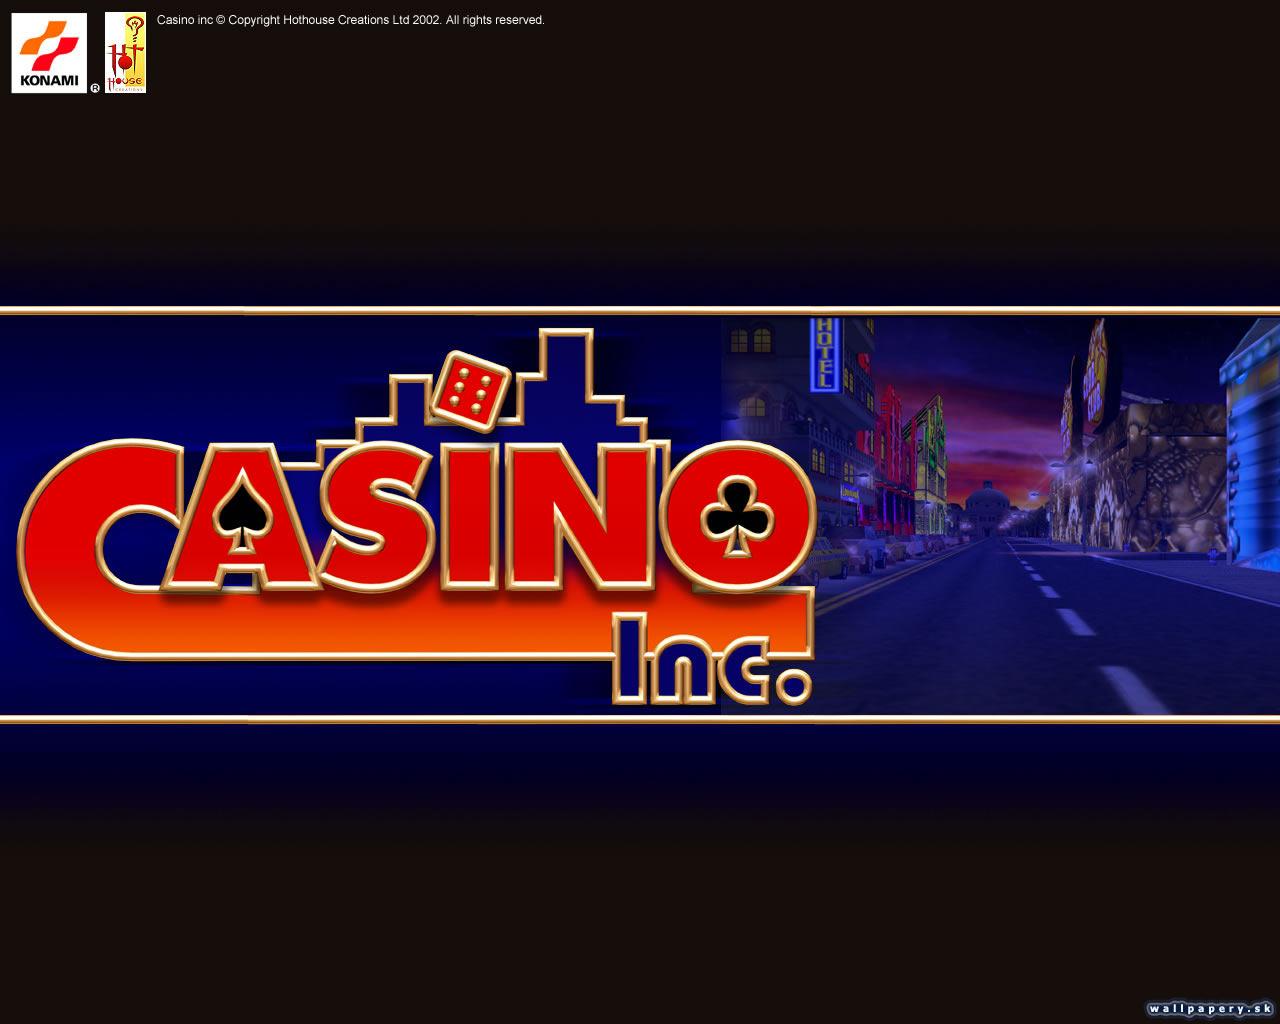 cherokee casino hotels nearby